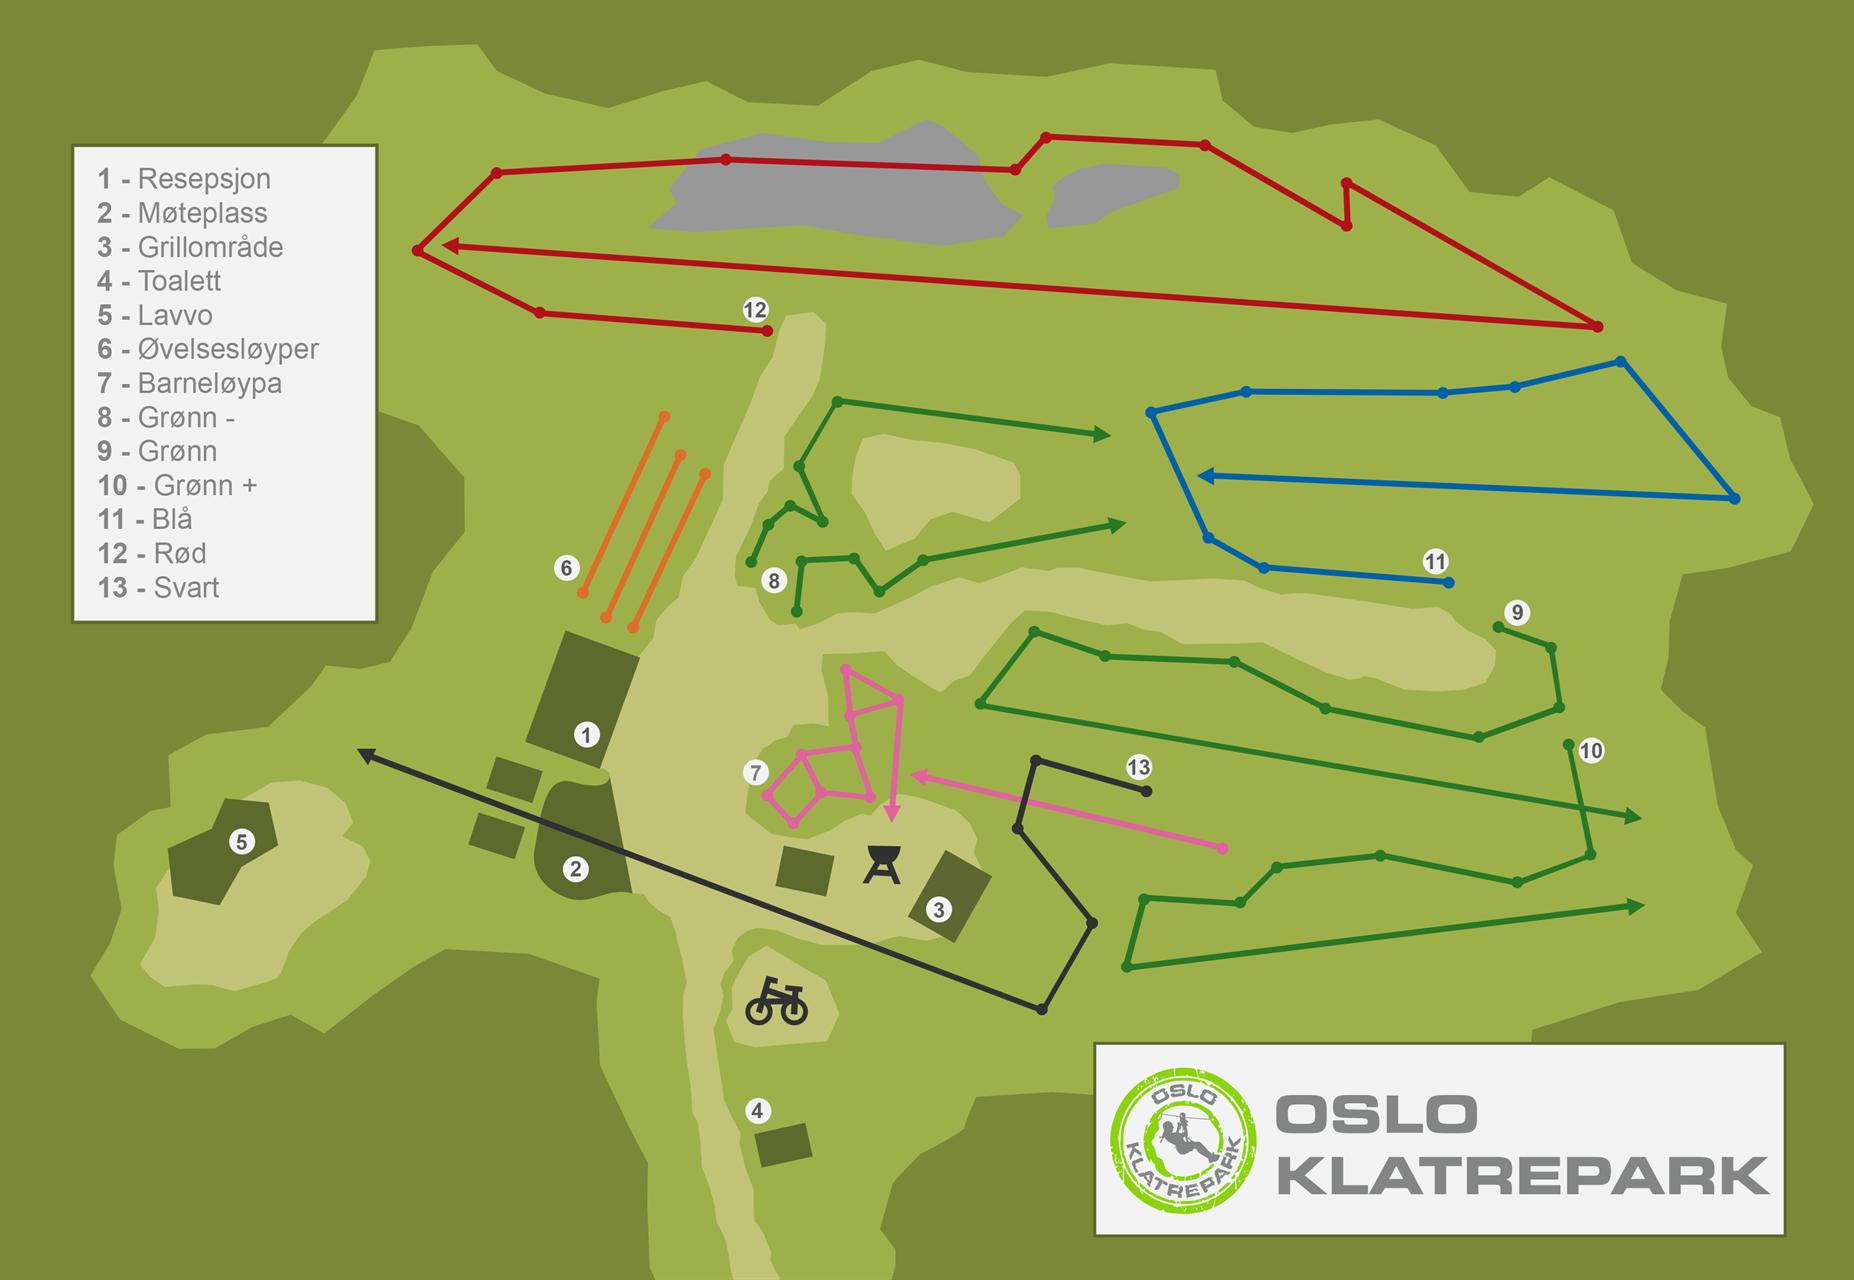 Oslo Klatrepark Oversiktskart